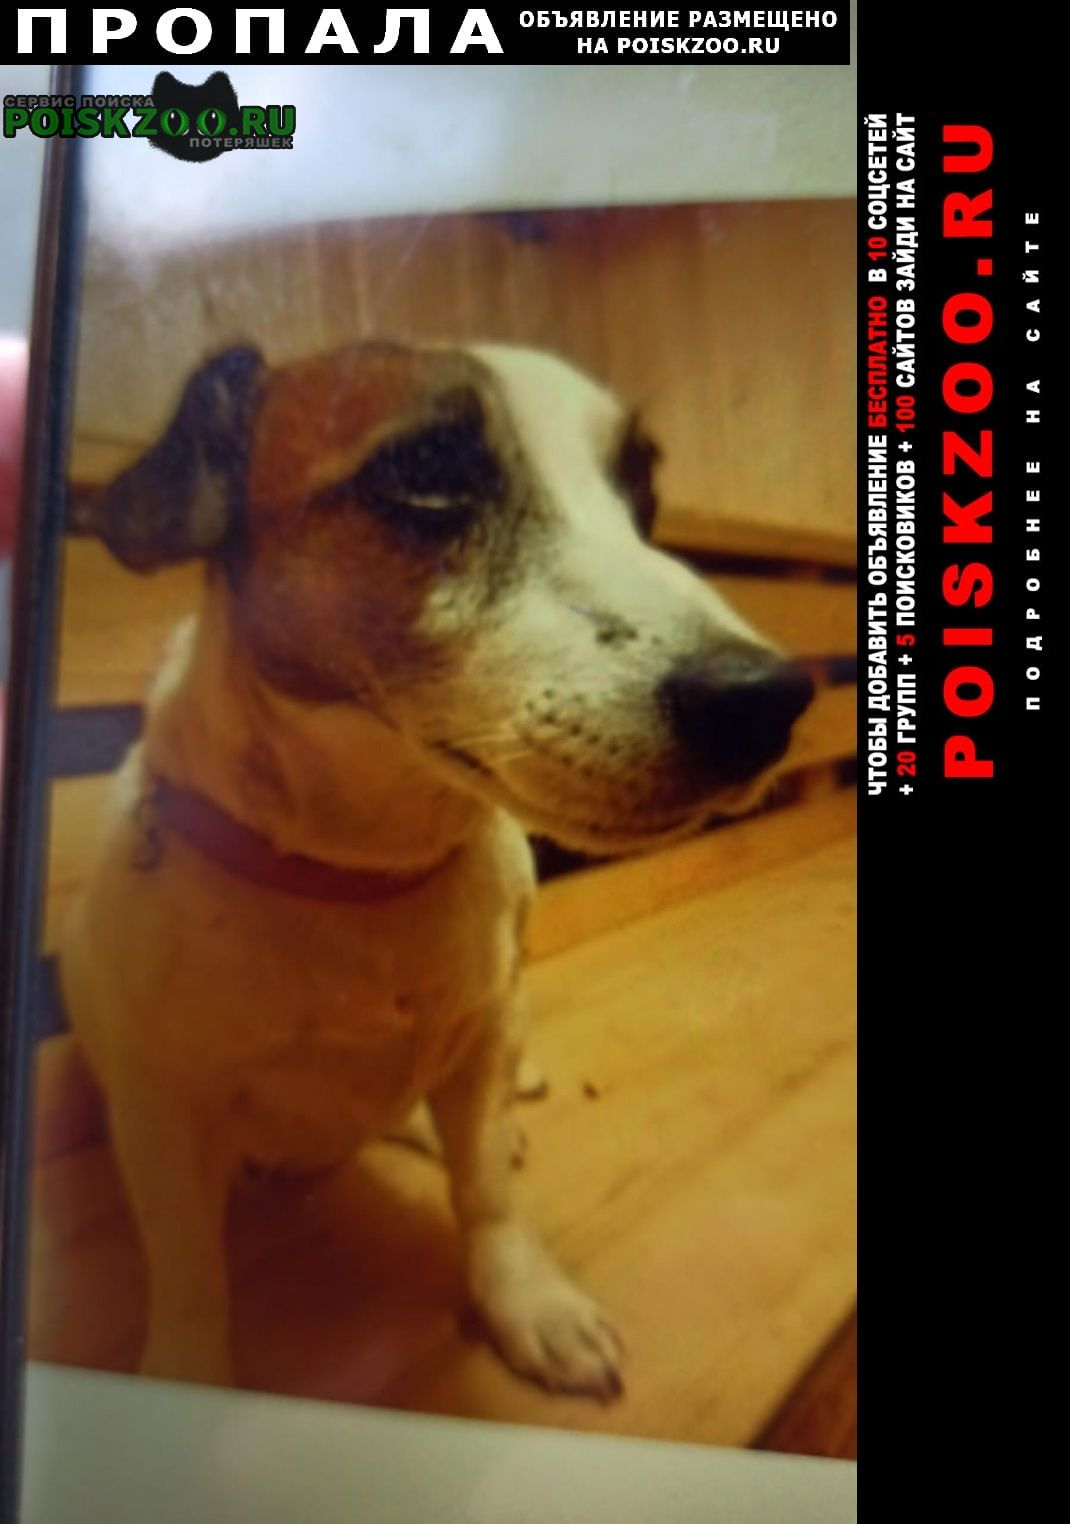 Пропала собака джек рассел терьер Екатеринбург